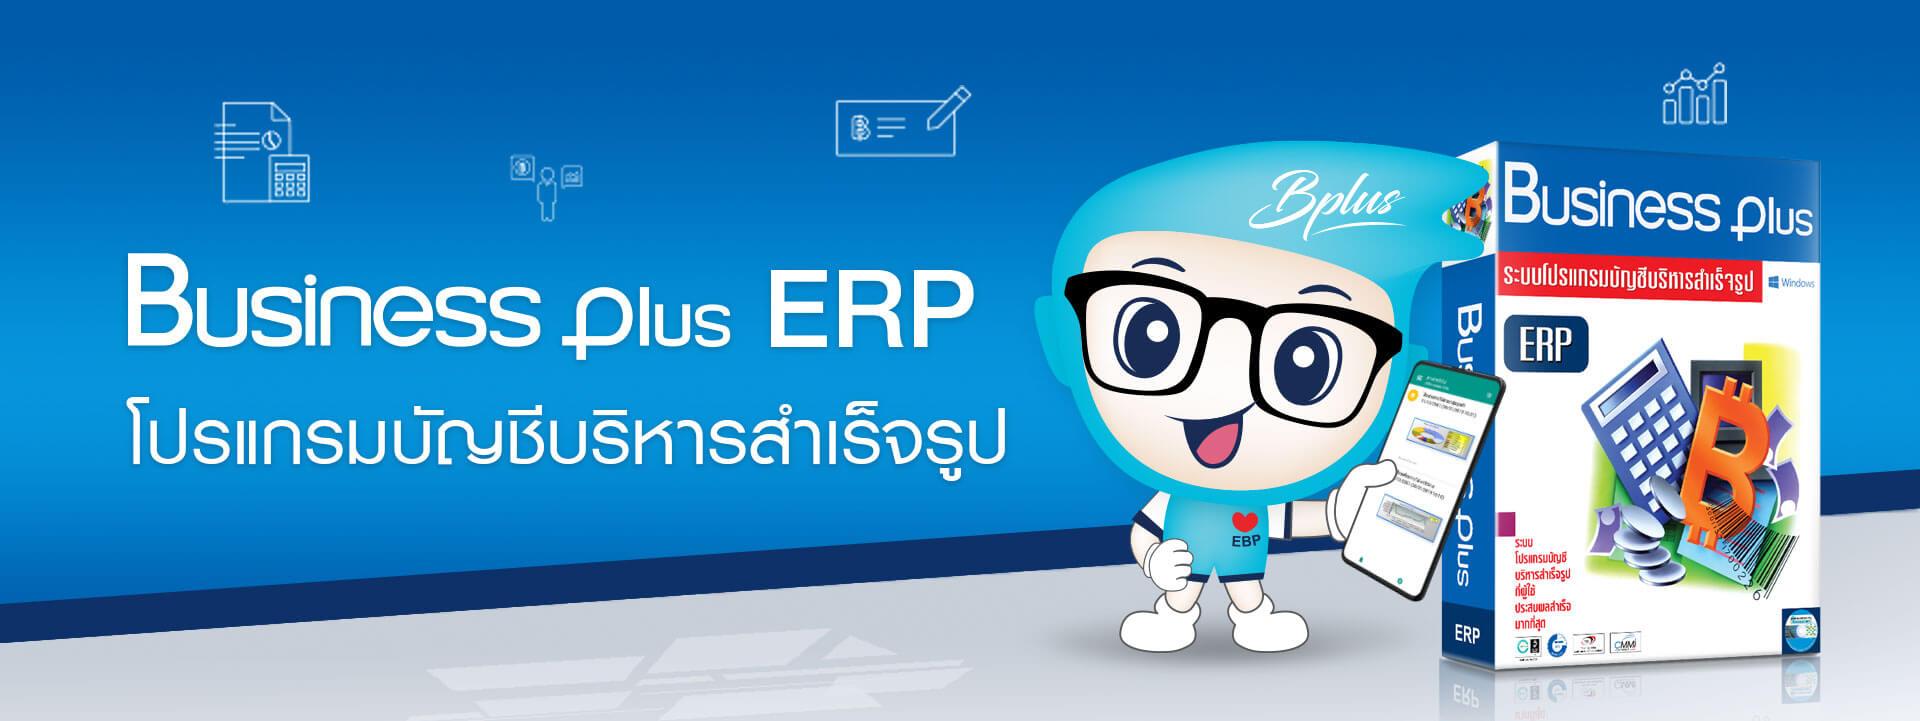 Business Plus โปรแกรมบัญชี